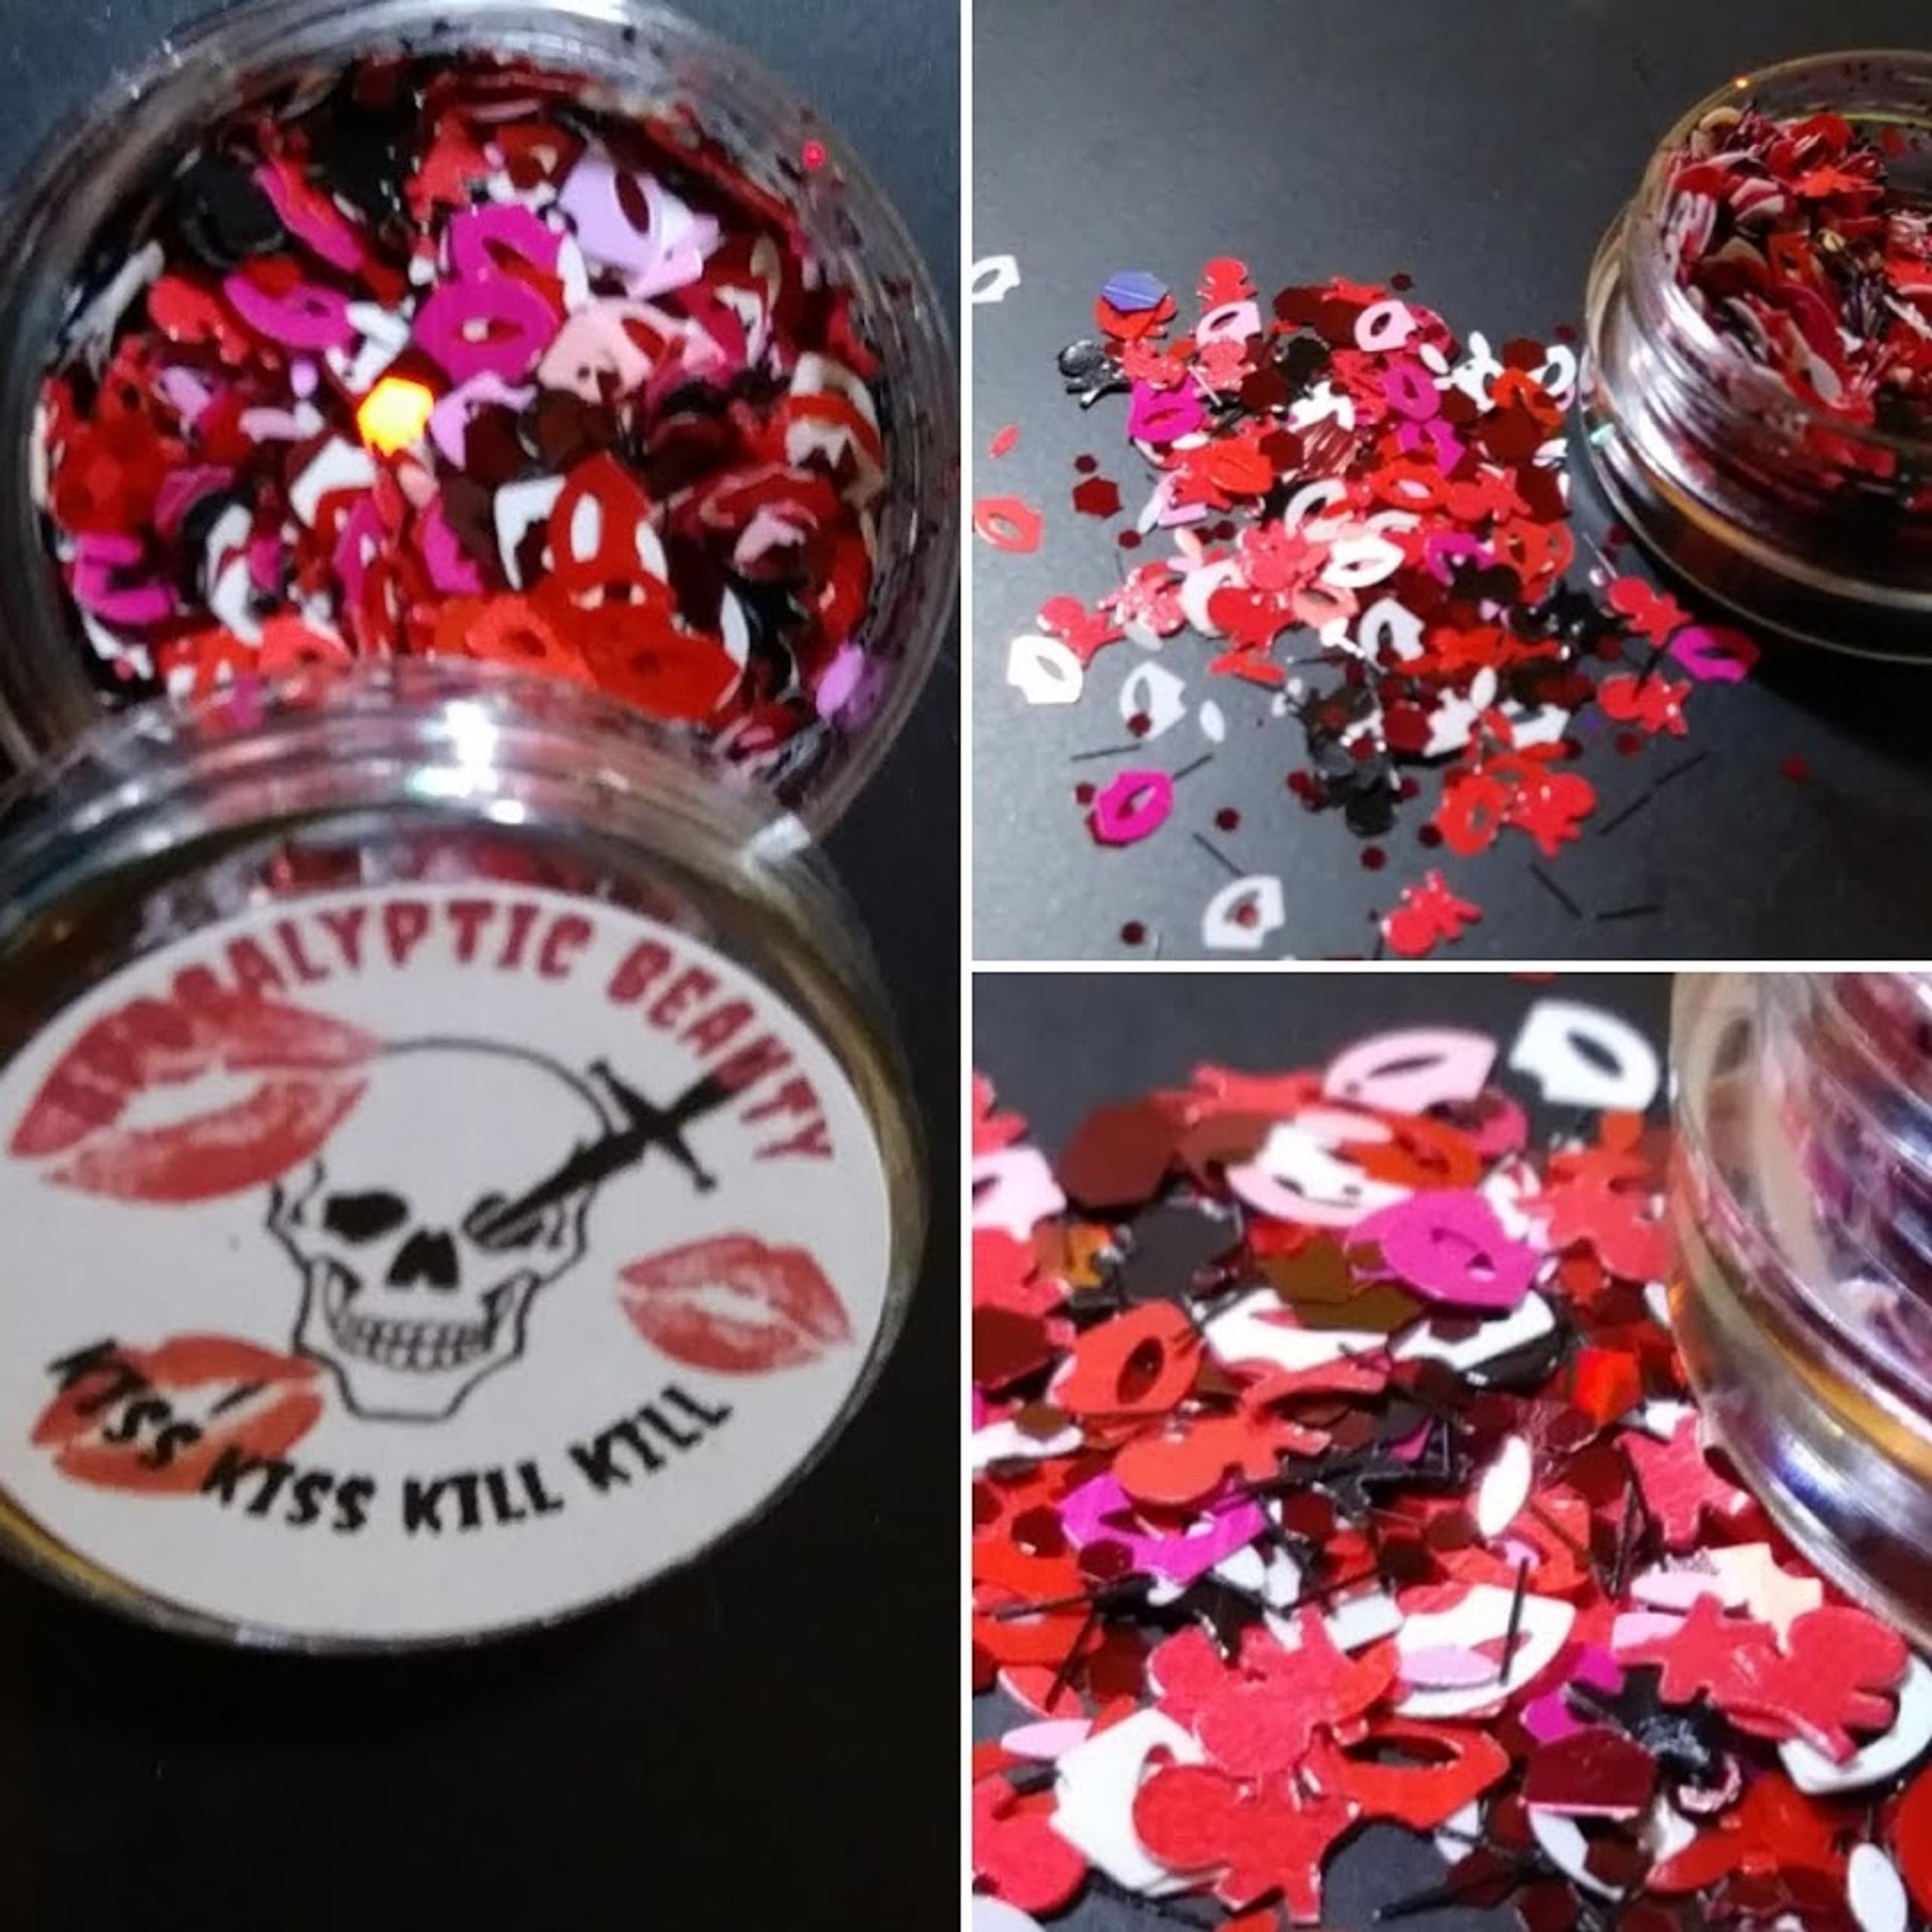 Kiss - Kiss Kiss Kill Kill (LE) - kisses and skulls chunky glitter blend